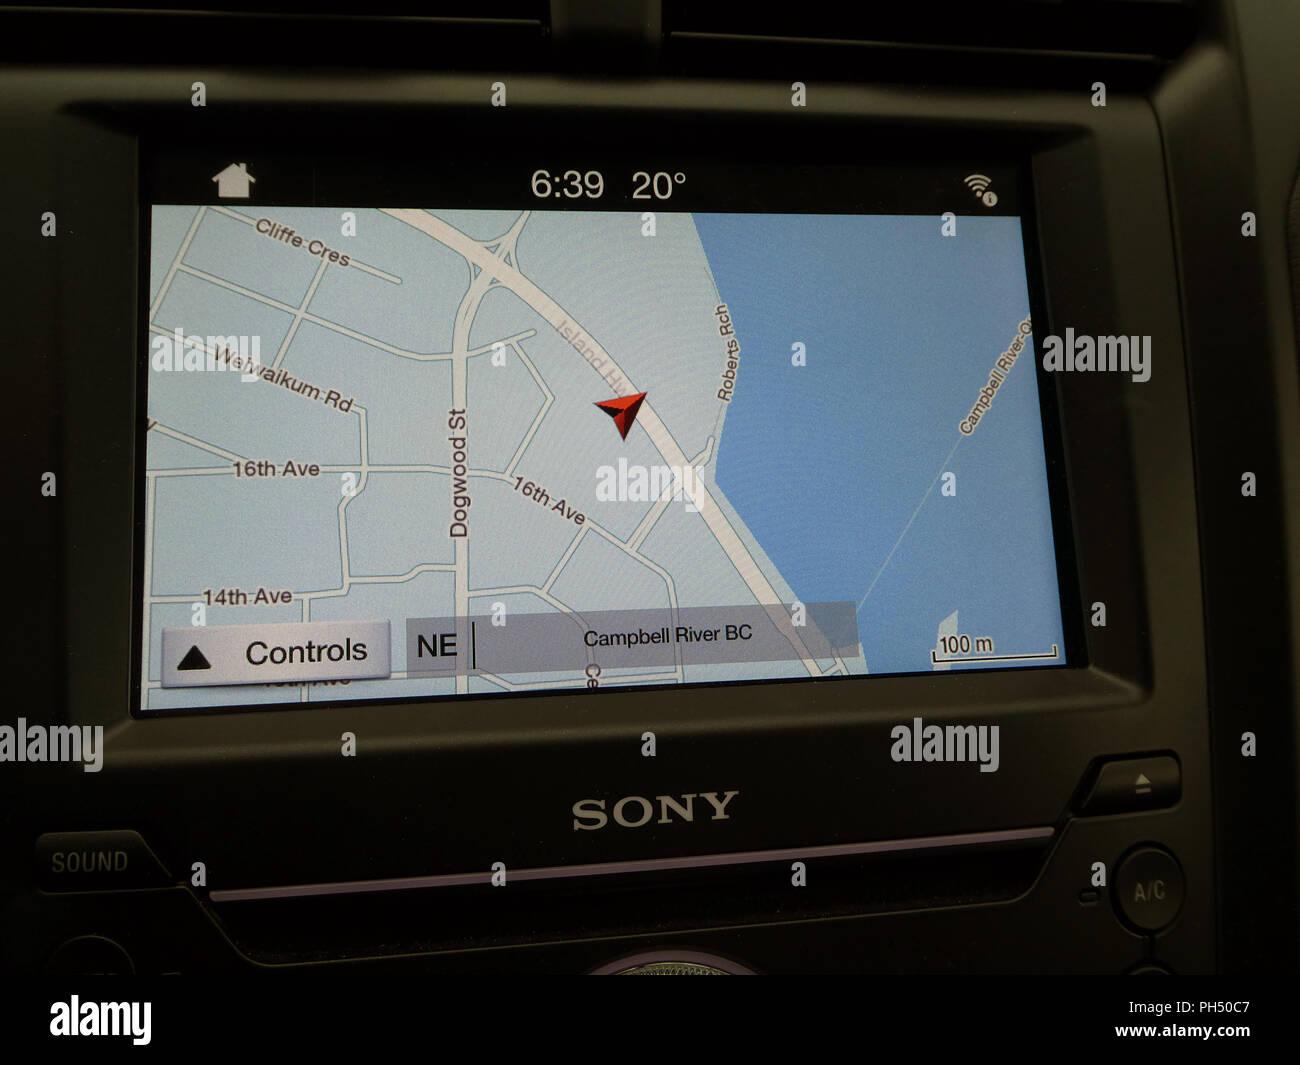 Satellite Navigation in-car display 2018 - Stock Image